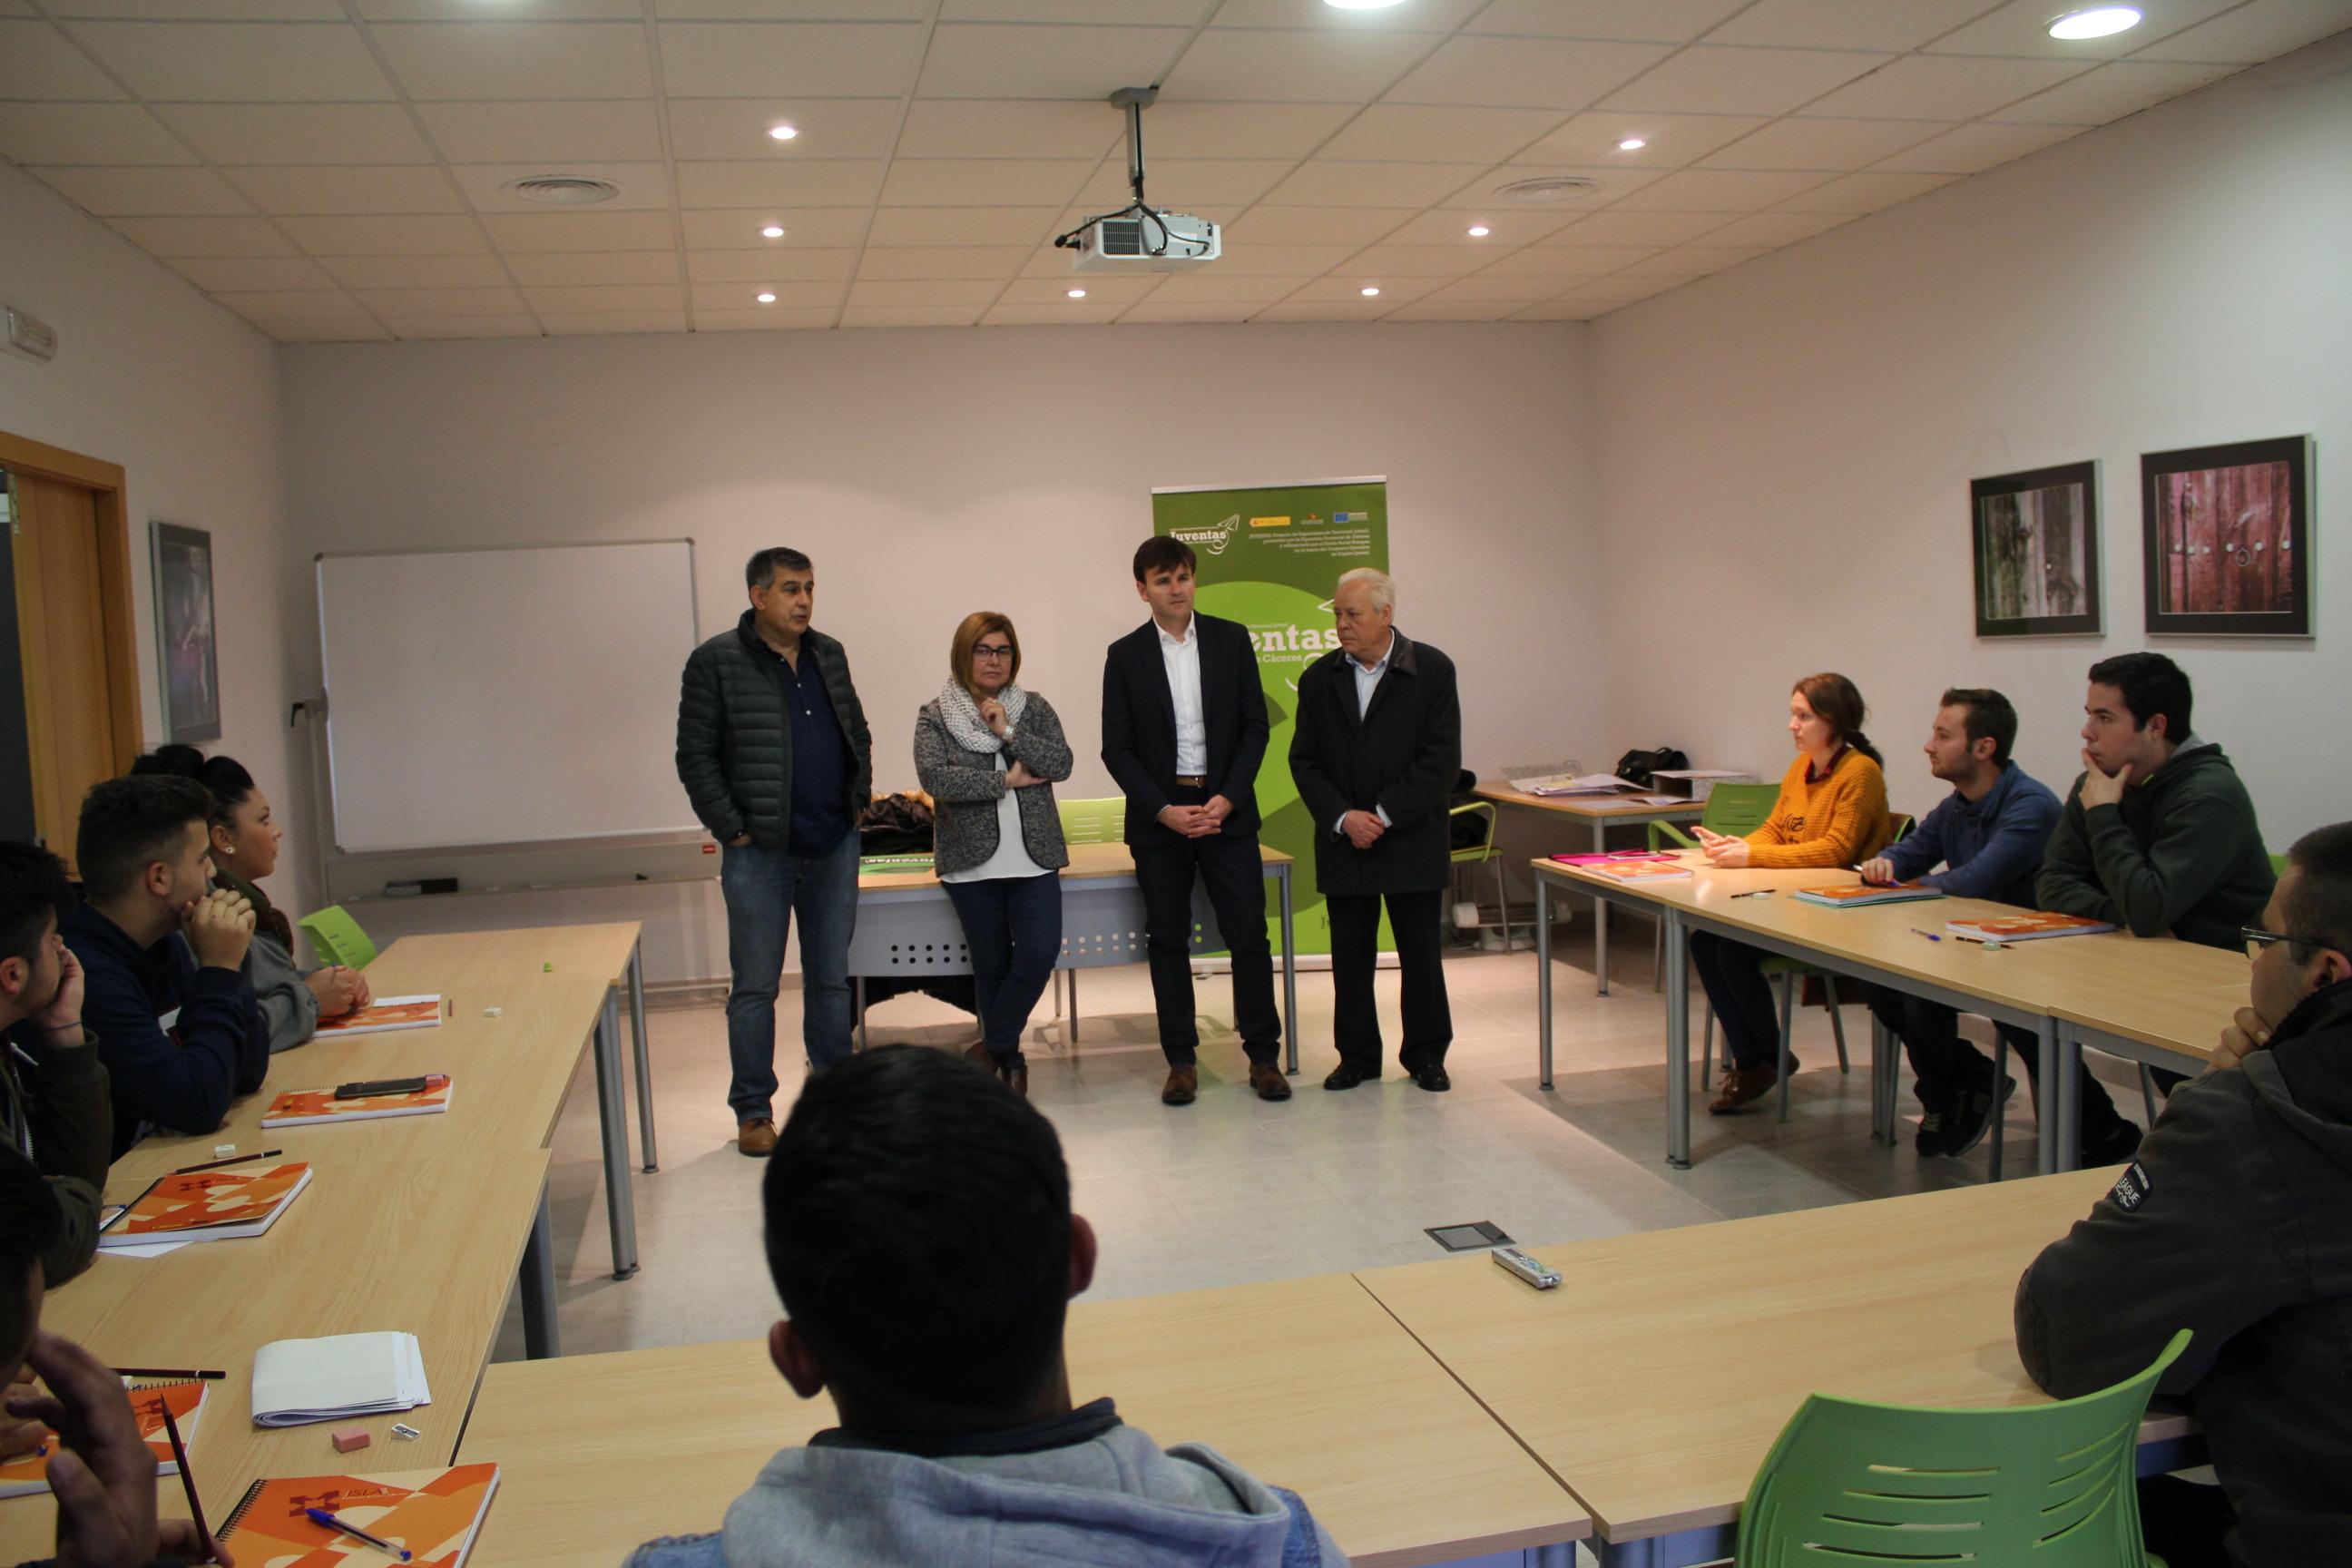 Juventas_Apertura_Curso (11)